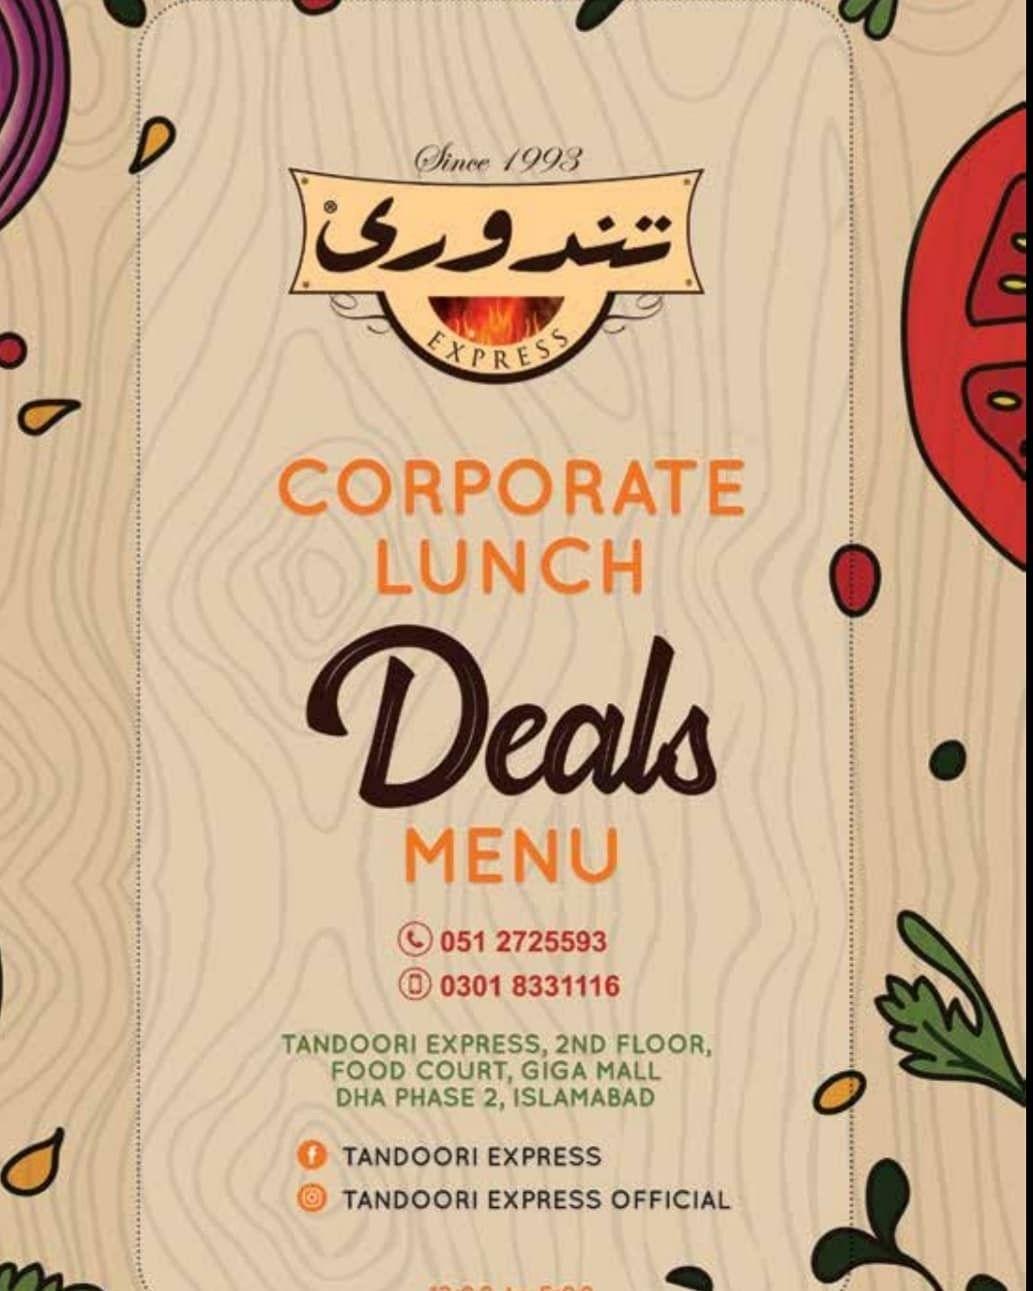 Tandoori Express introducing Corporate Lunch deals menu